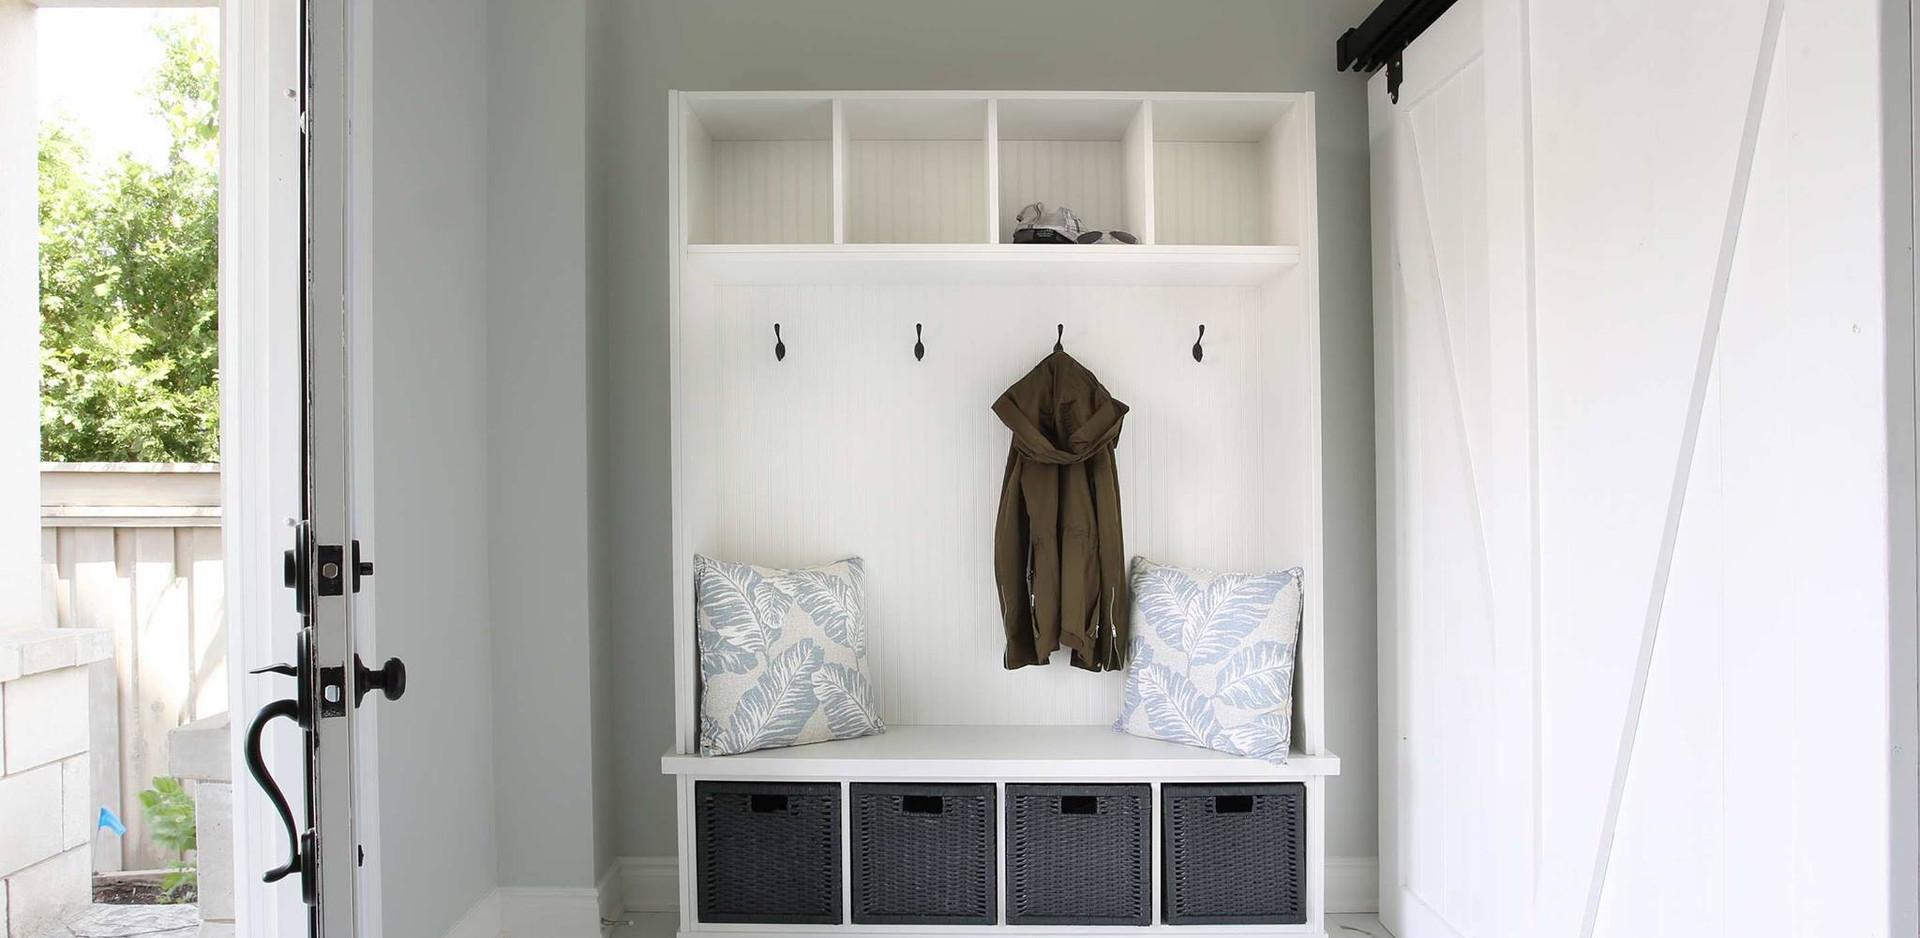 New Entrance and custom cabinet & closet door